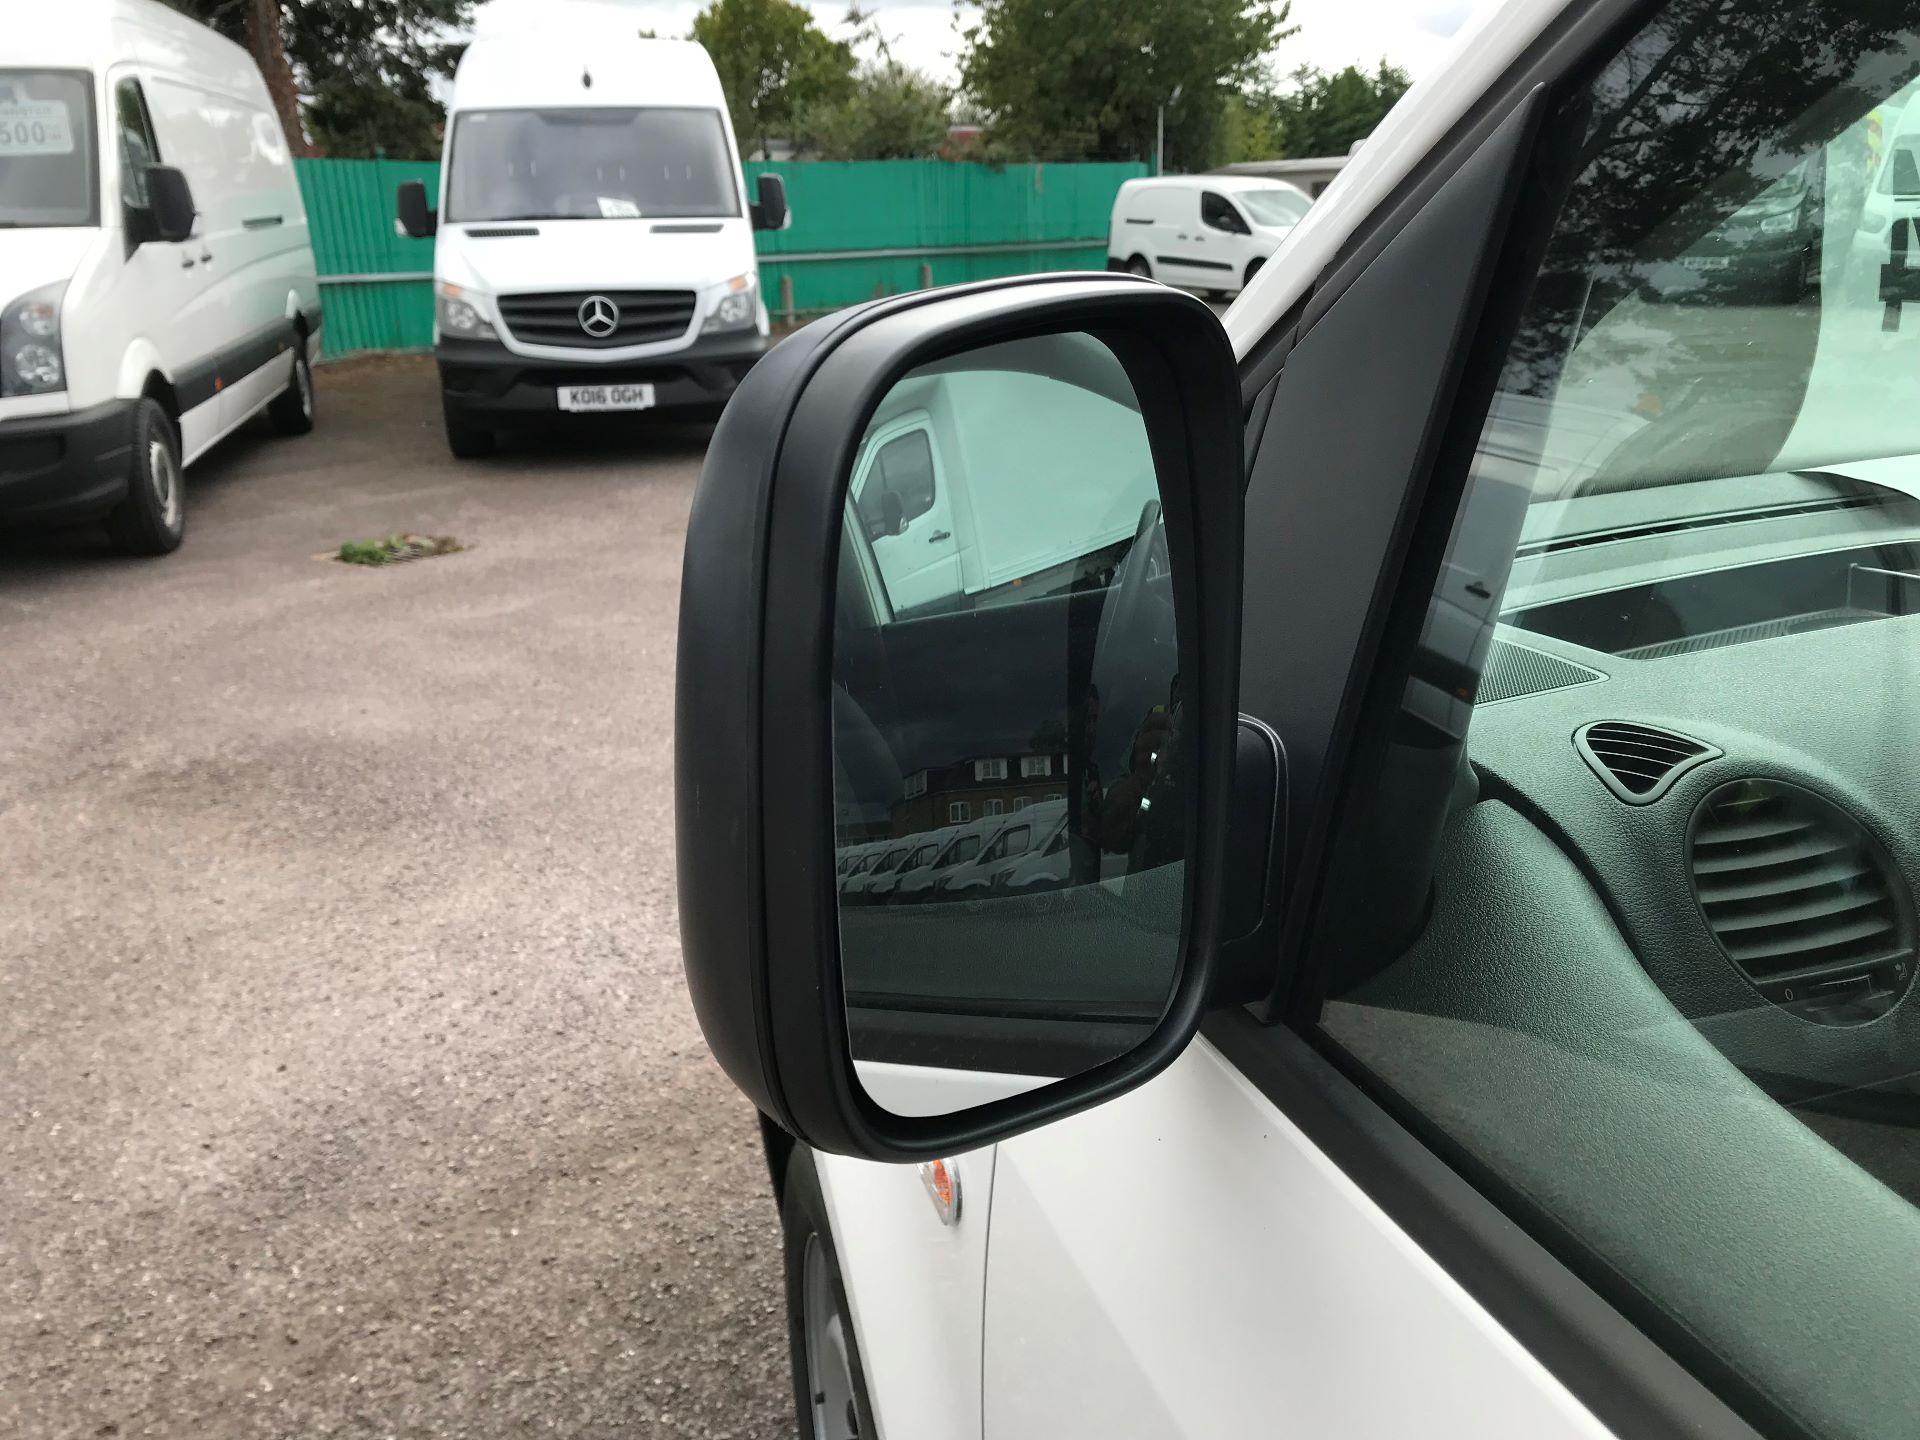 2014 Volkswagen Caddy   1.6 75PS   STARTLINE EURO 5 (DY64BUA) Image 11